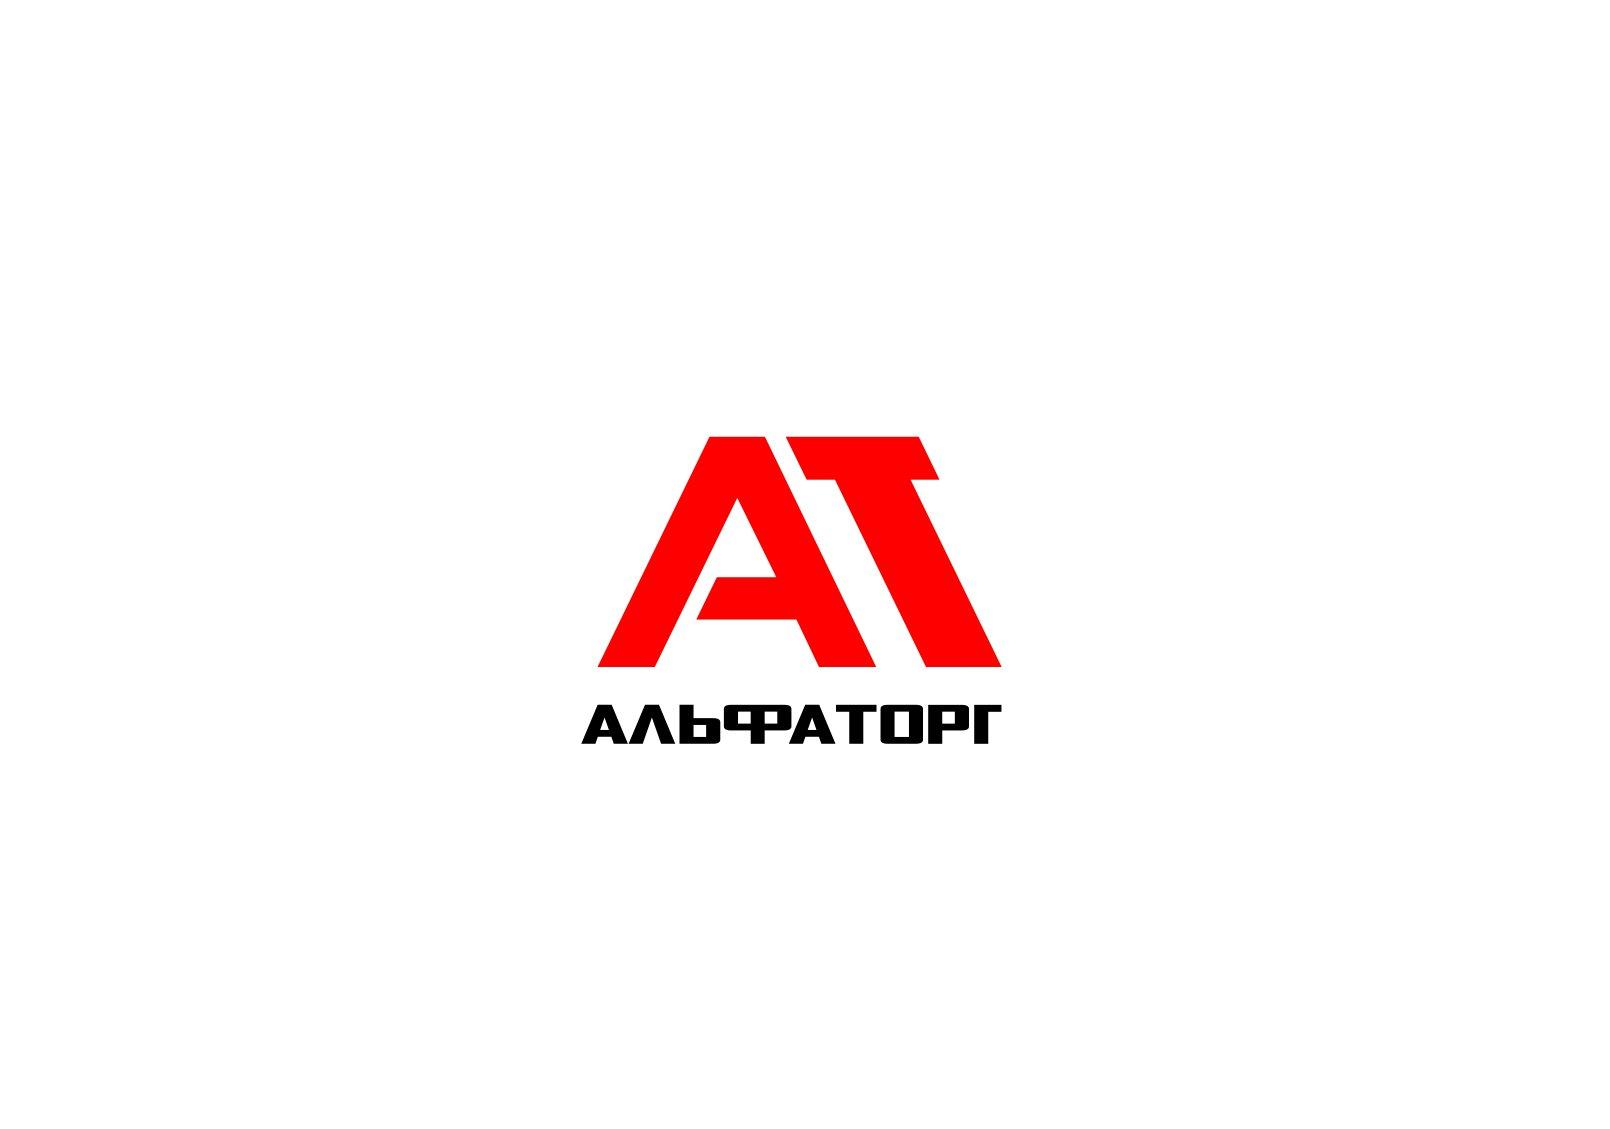 Логотип и фирменный стиль фото f_4805f08dff87c257.jpg